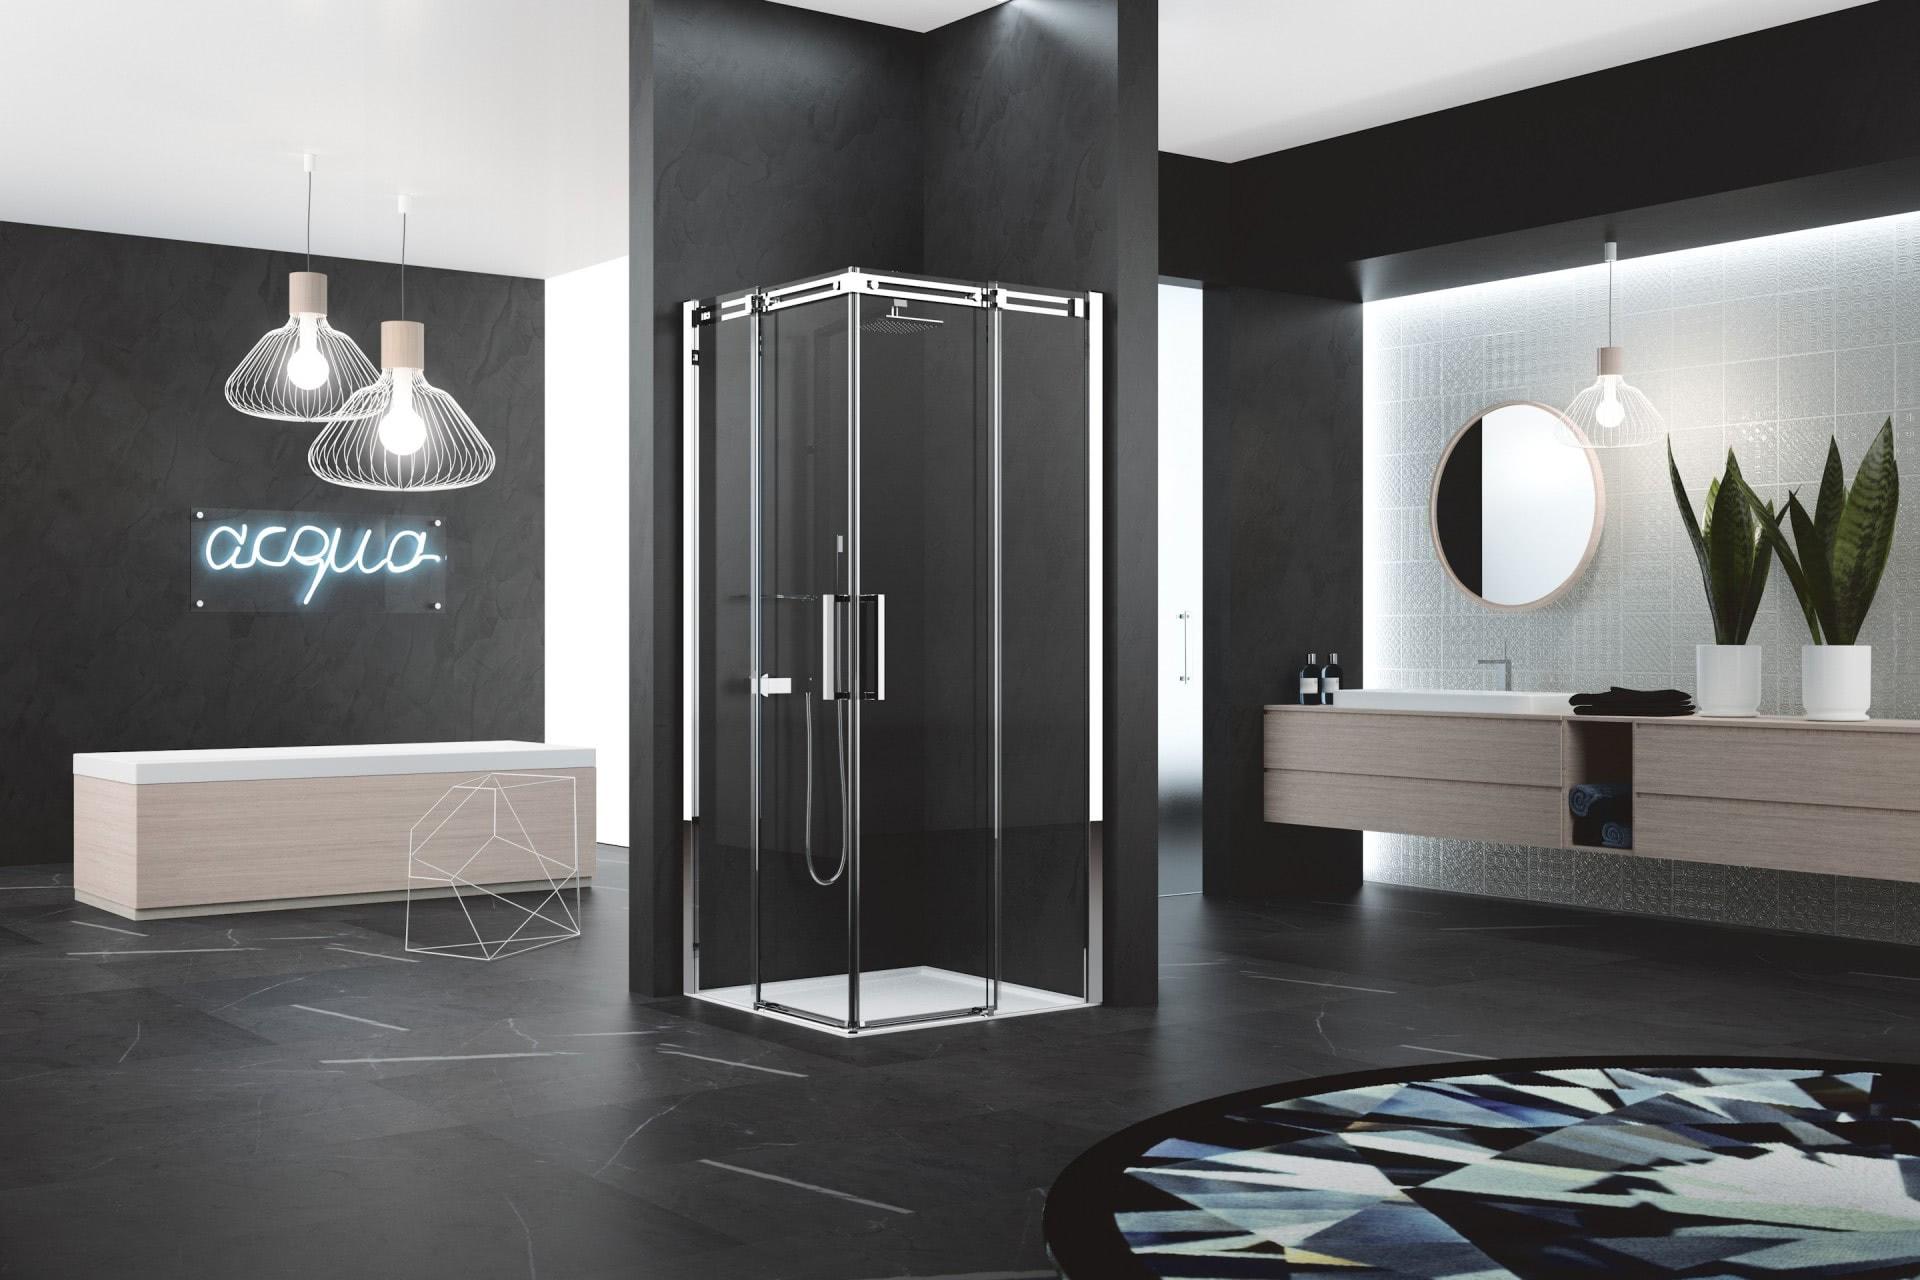 Tipos de mamparas de ducha acana interiorismo - Tipos de mamparas de ducha ...